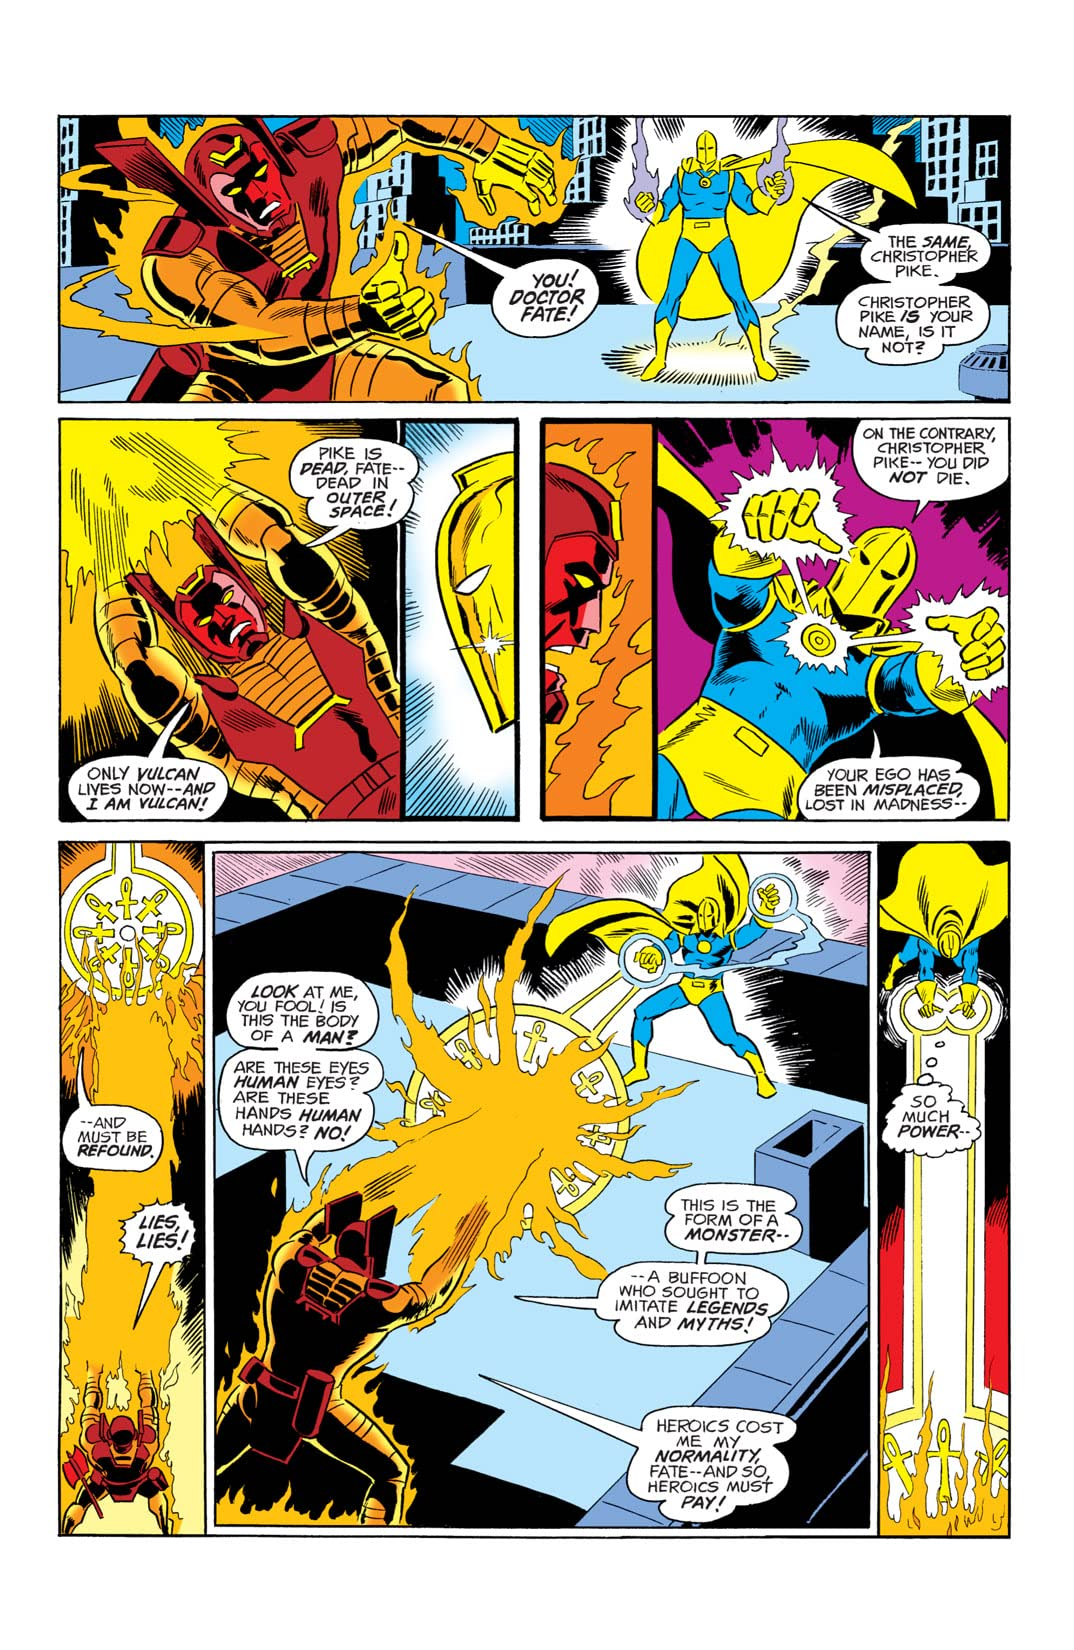 All-Star Comics #61